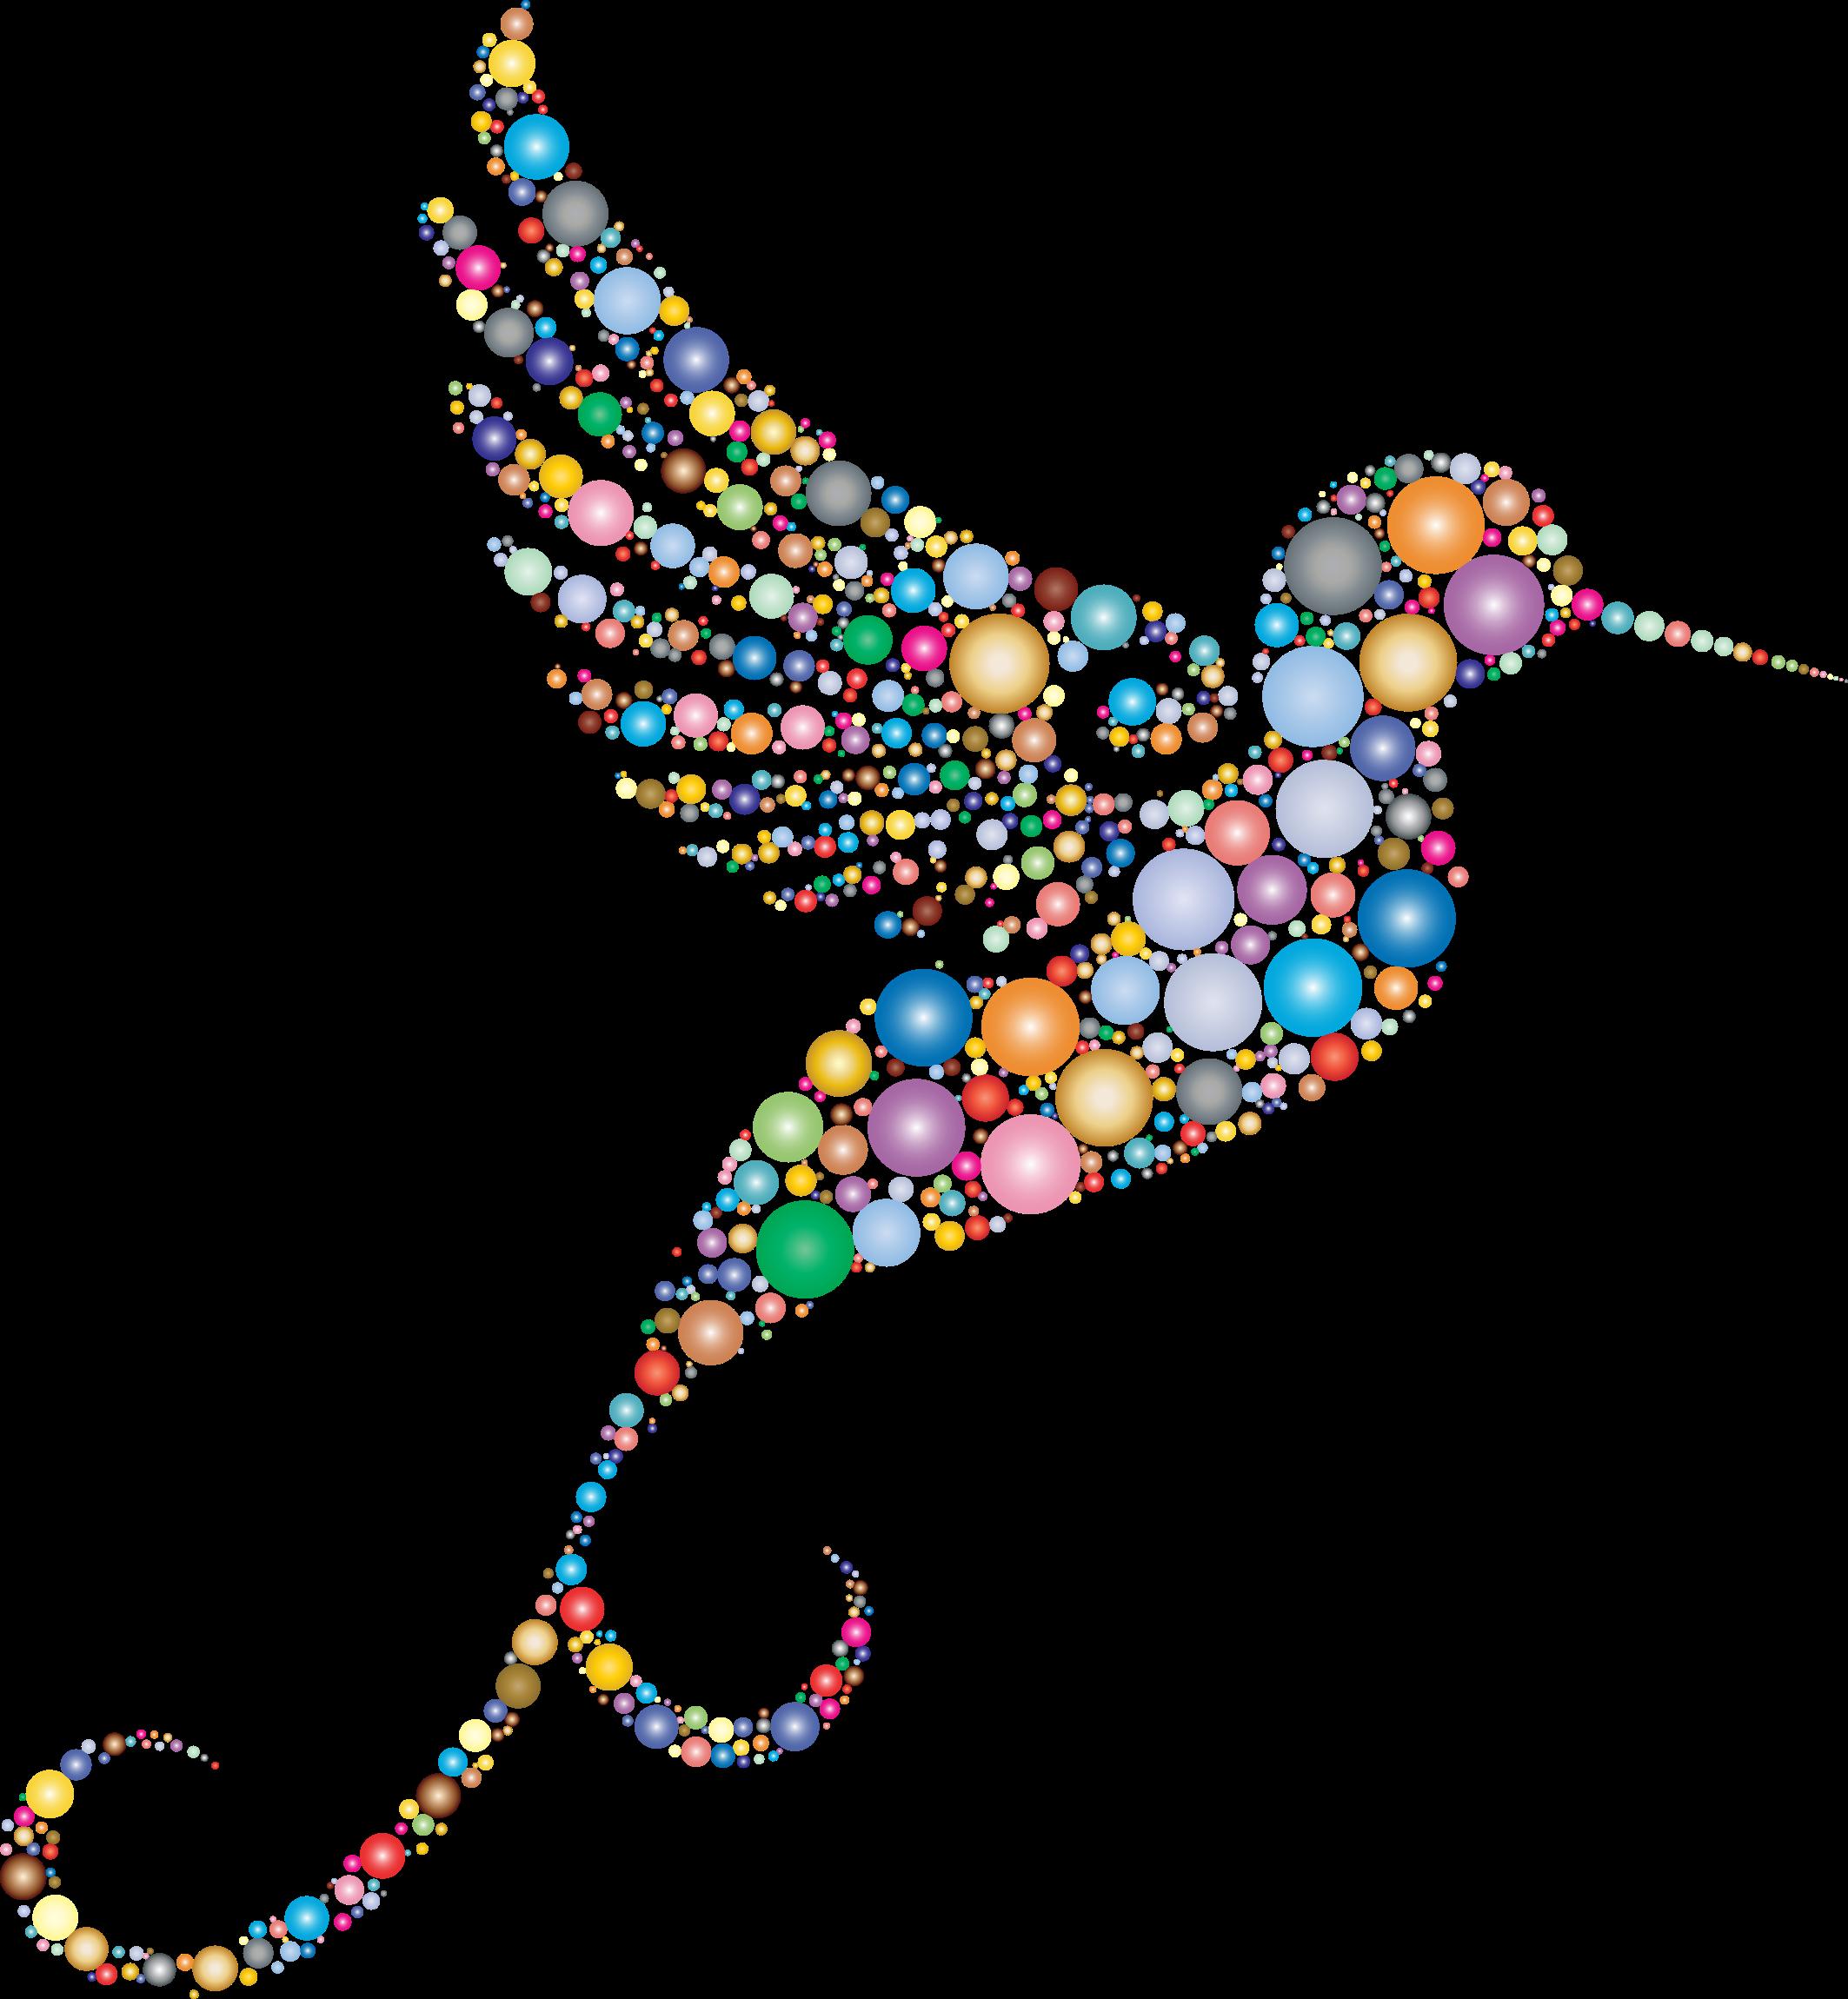 Hummingbird clipart abstract. Prismatic circles no background